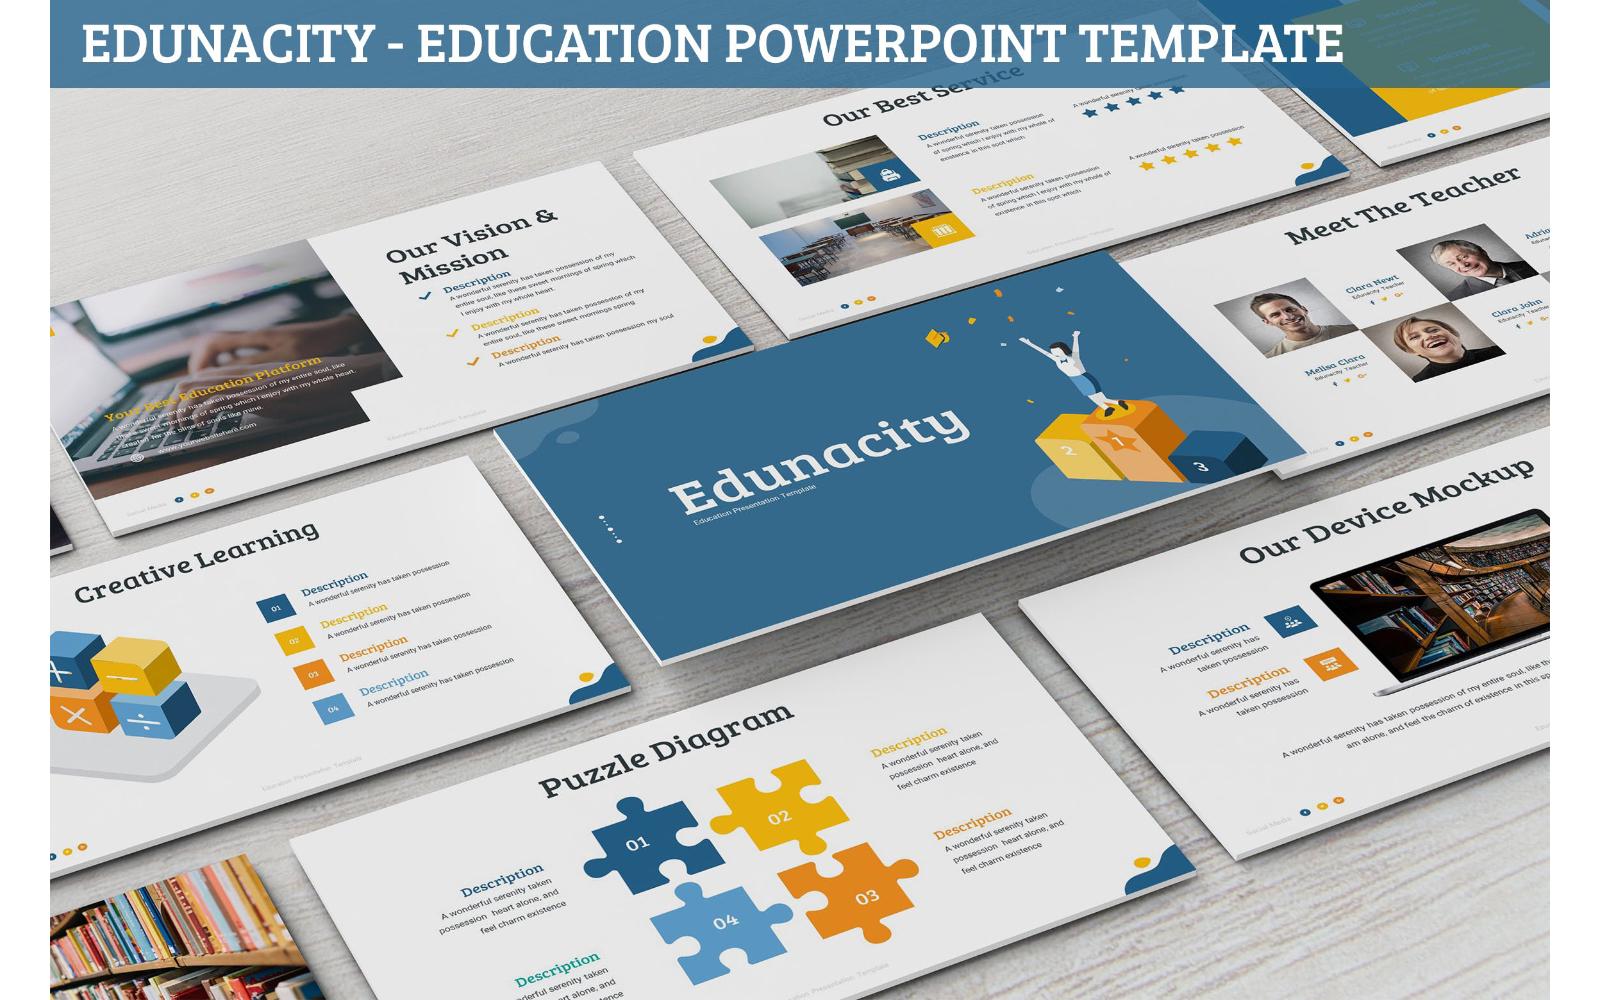 Edunacity - Education Powerpoint Template